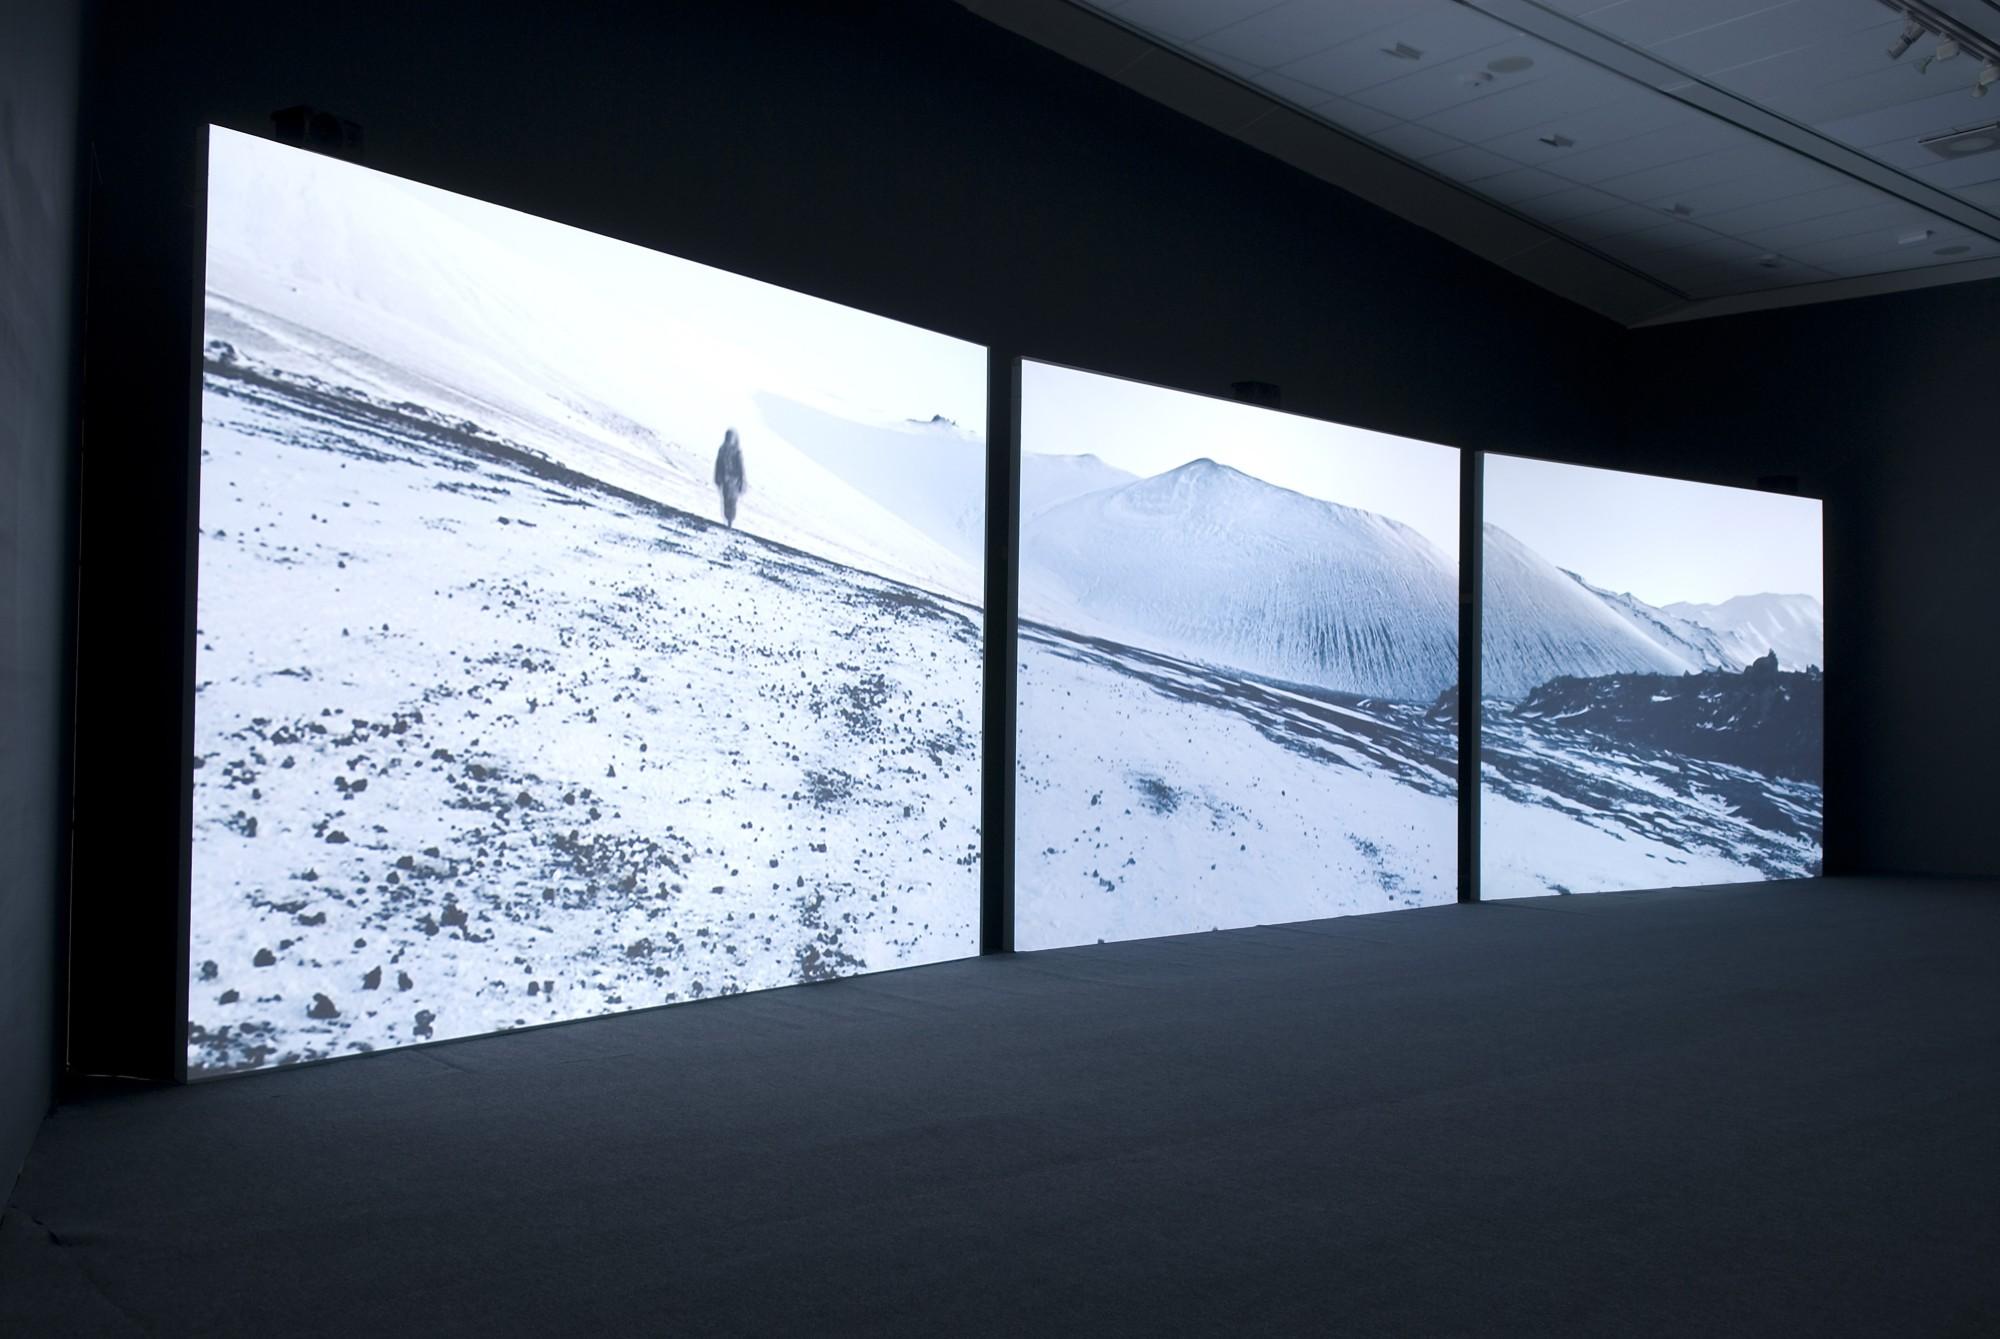 Isaac Julien: True North. Bildmuseet, Umeå University, 2007  14'' 20', three-screen projection, 16mm film transferred to DVD, black & white/colour, sound.